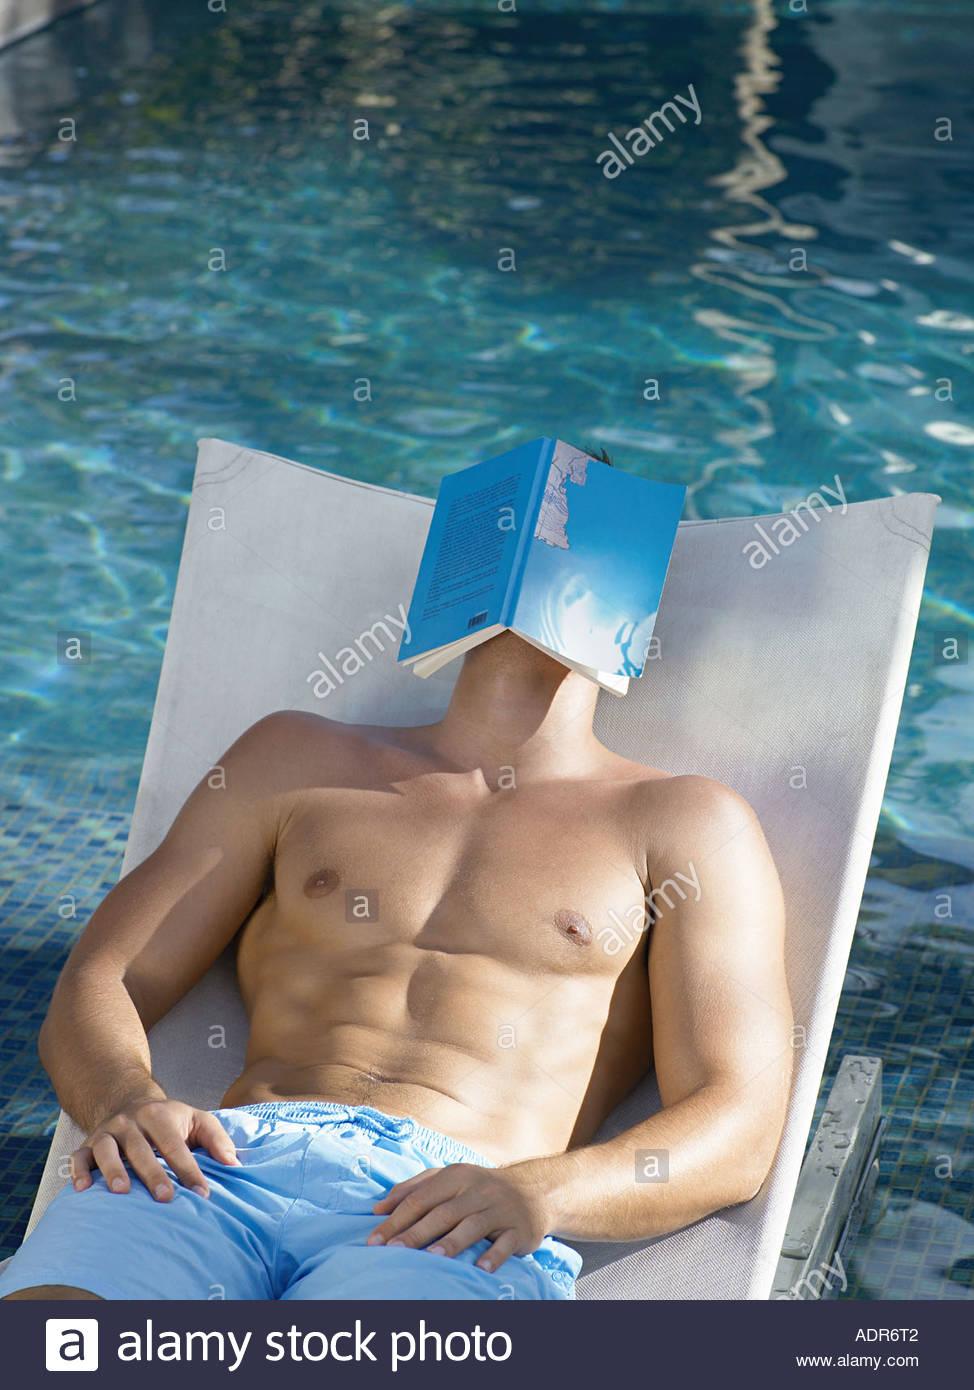 Pool Lounge Stockfotos & Pool Lounge Bilder - Alamy